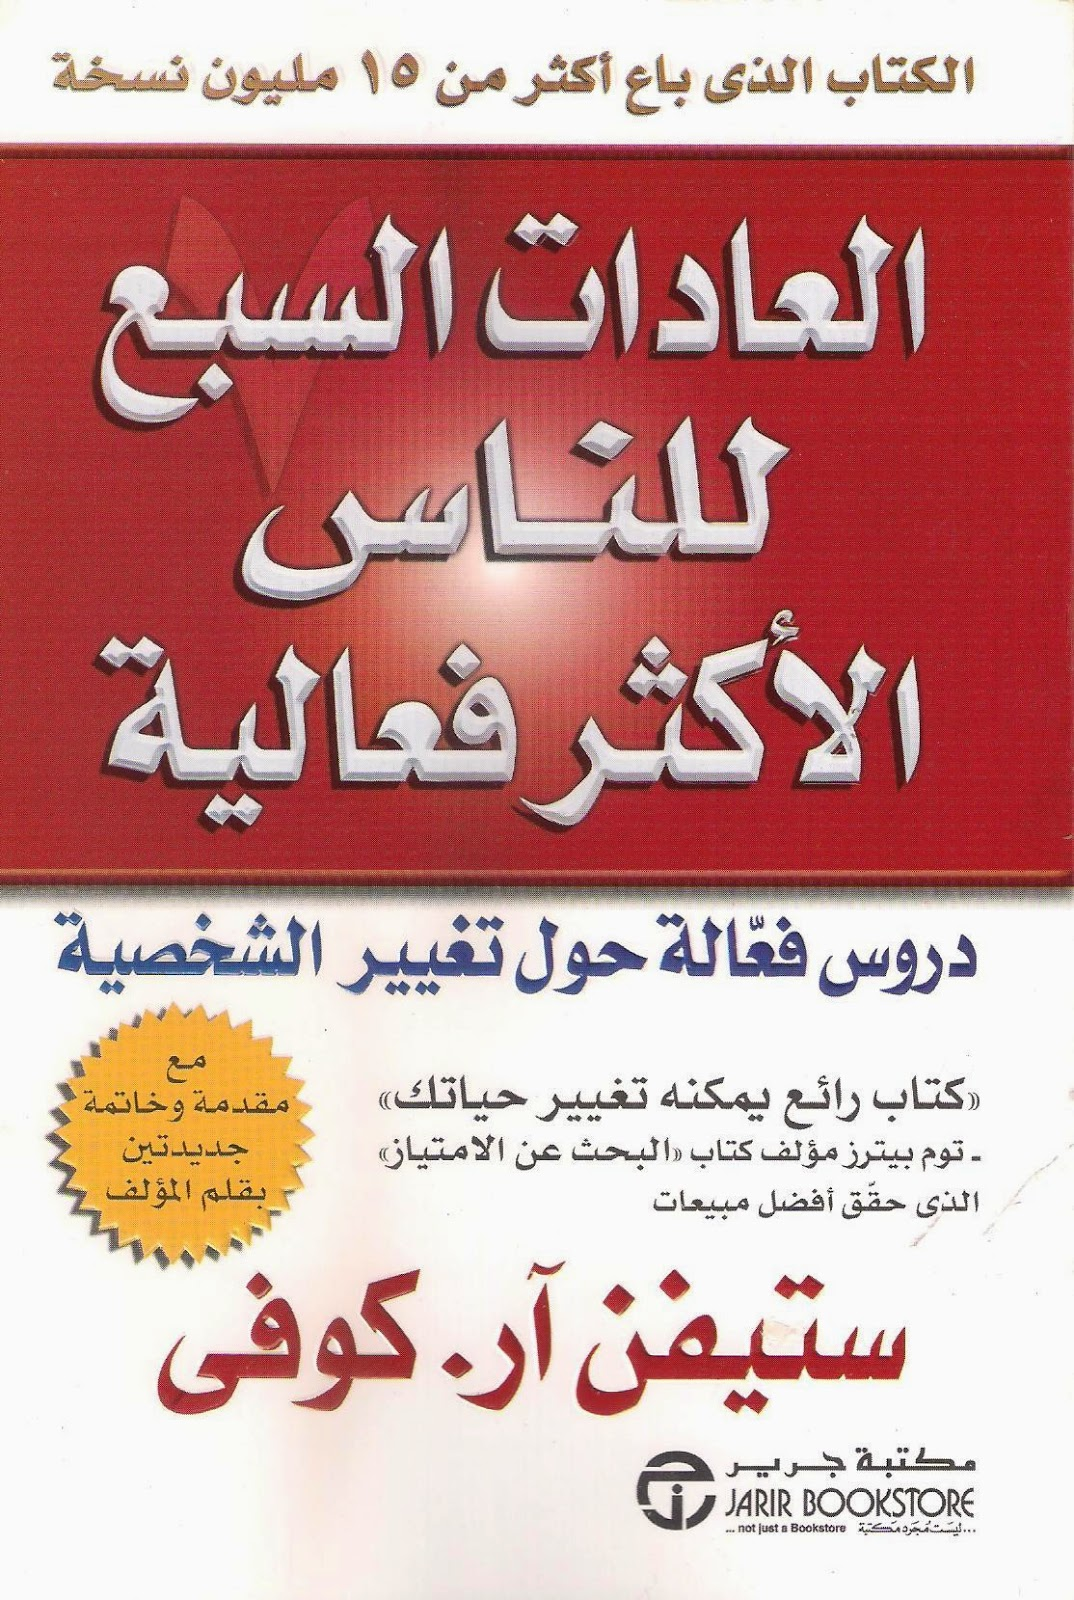 Photo of تحميل كتاب سيكولوجية الجماهير pdfلـ  غوستاف لوبون